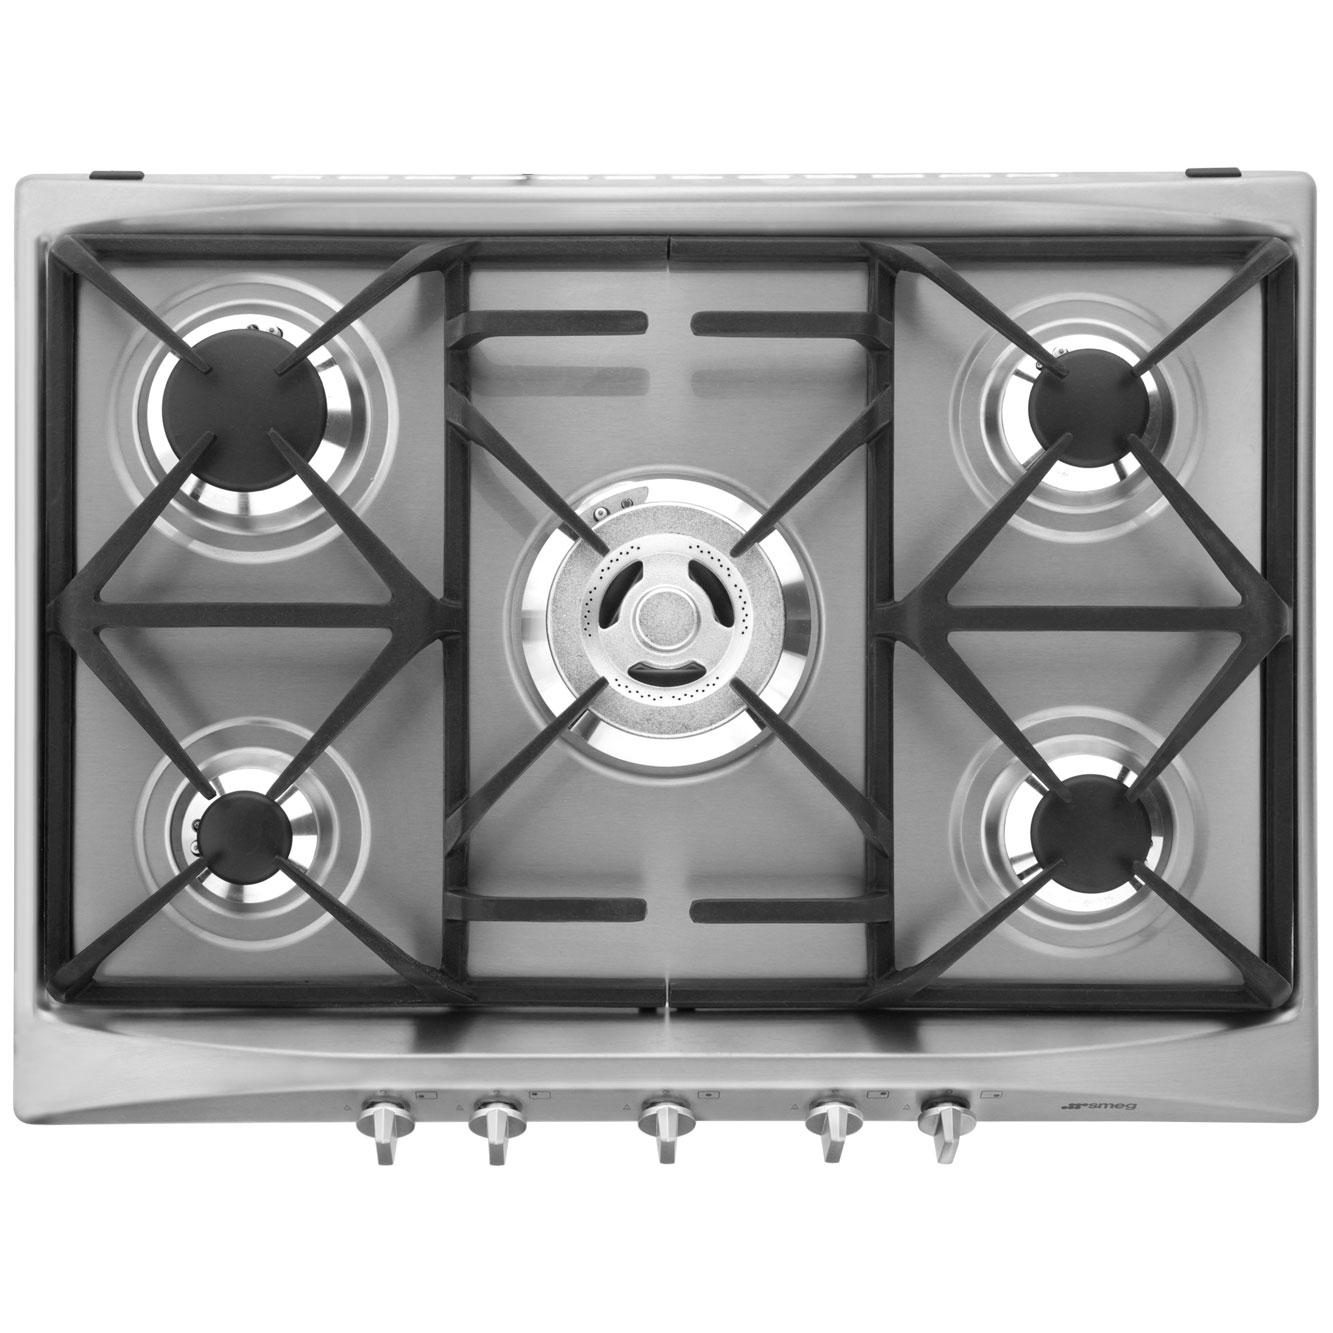 Buy cheap smeg stainless steel gas hob compare hobs - Smeg cucina gas ...